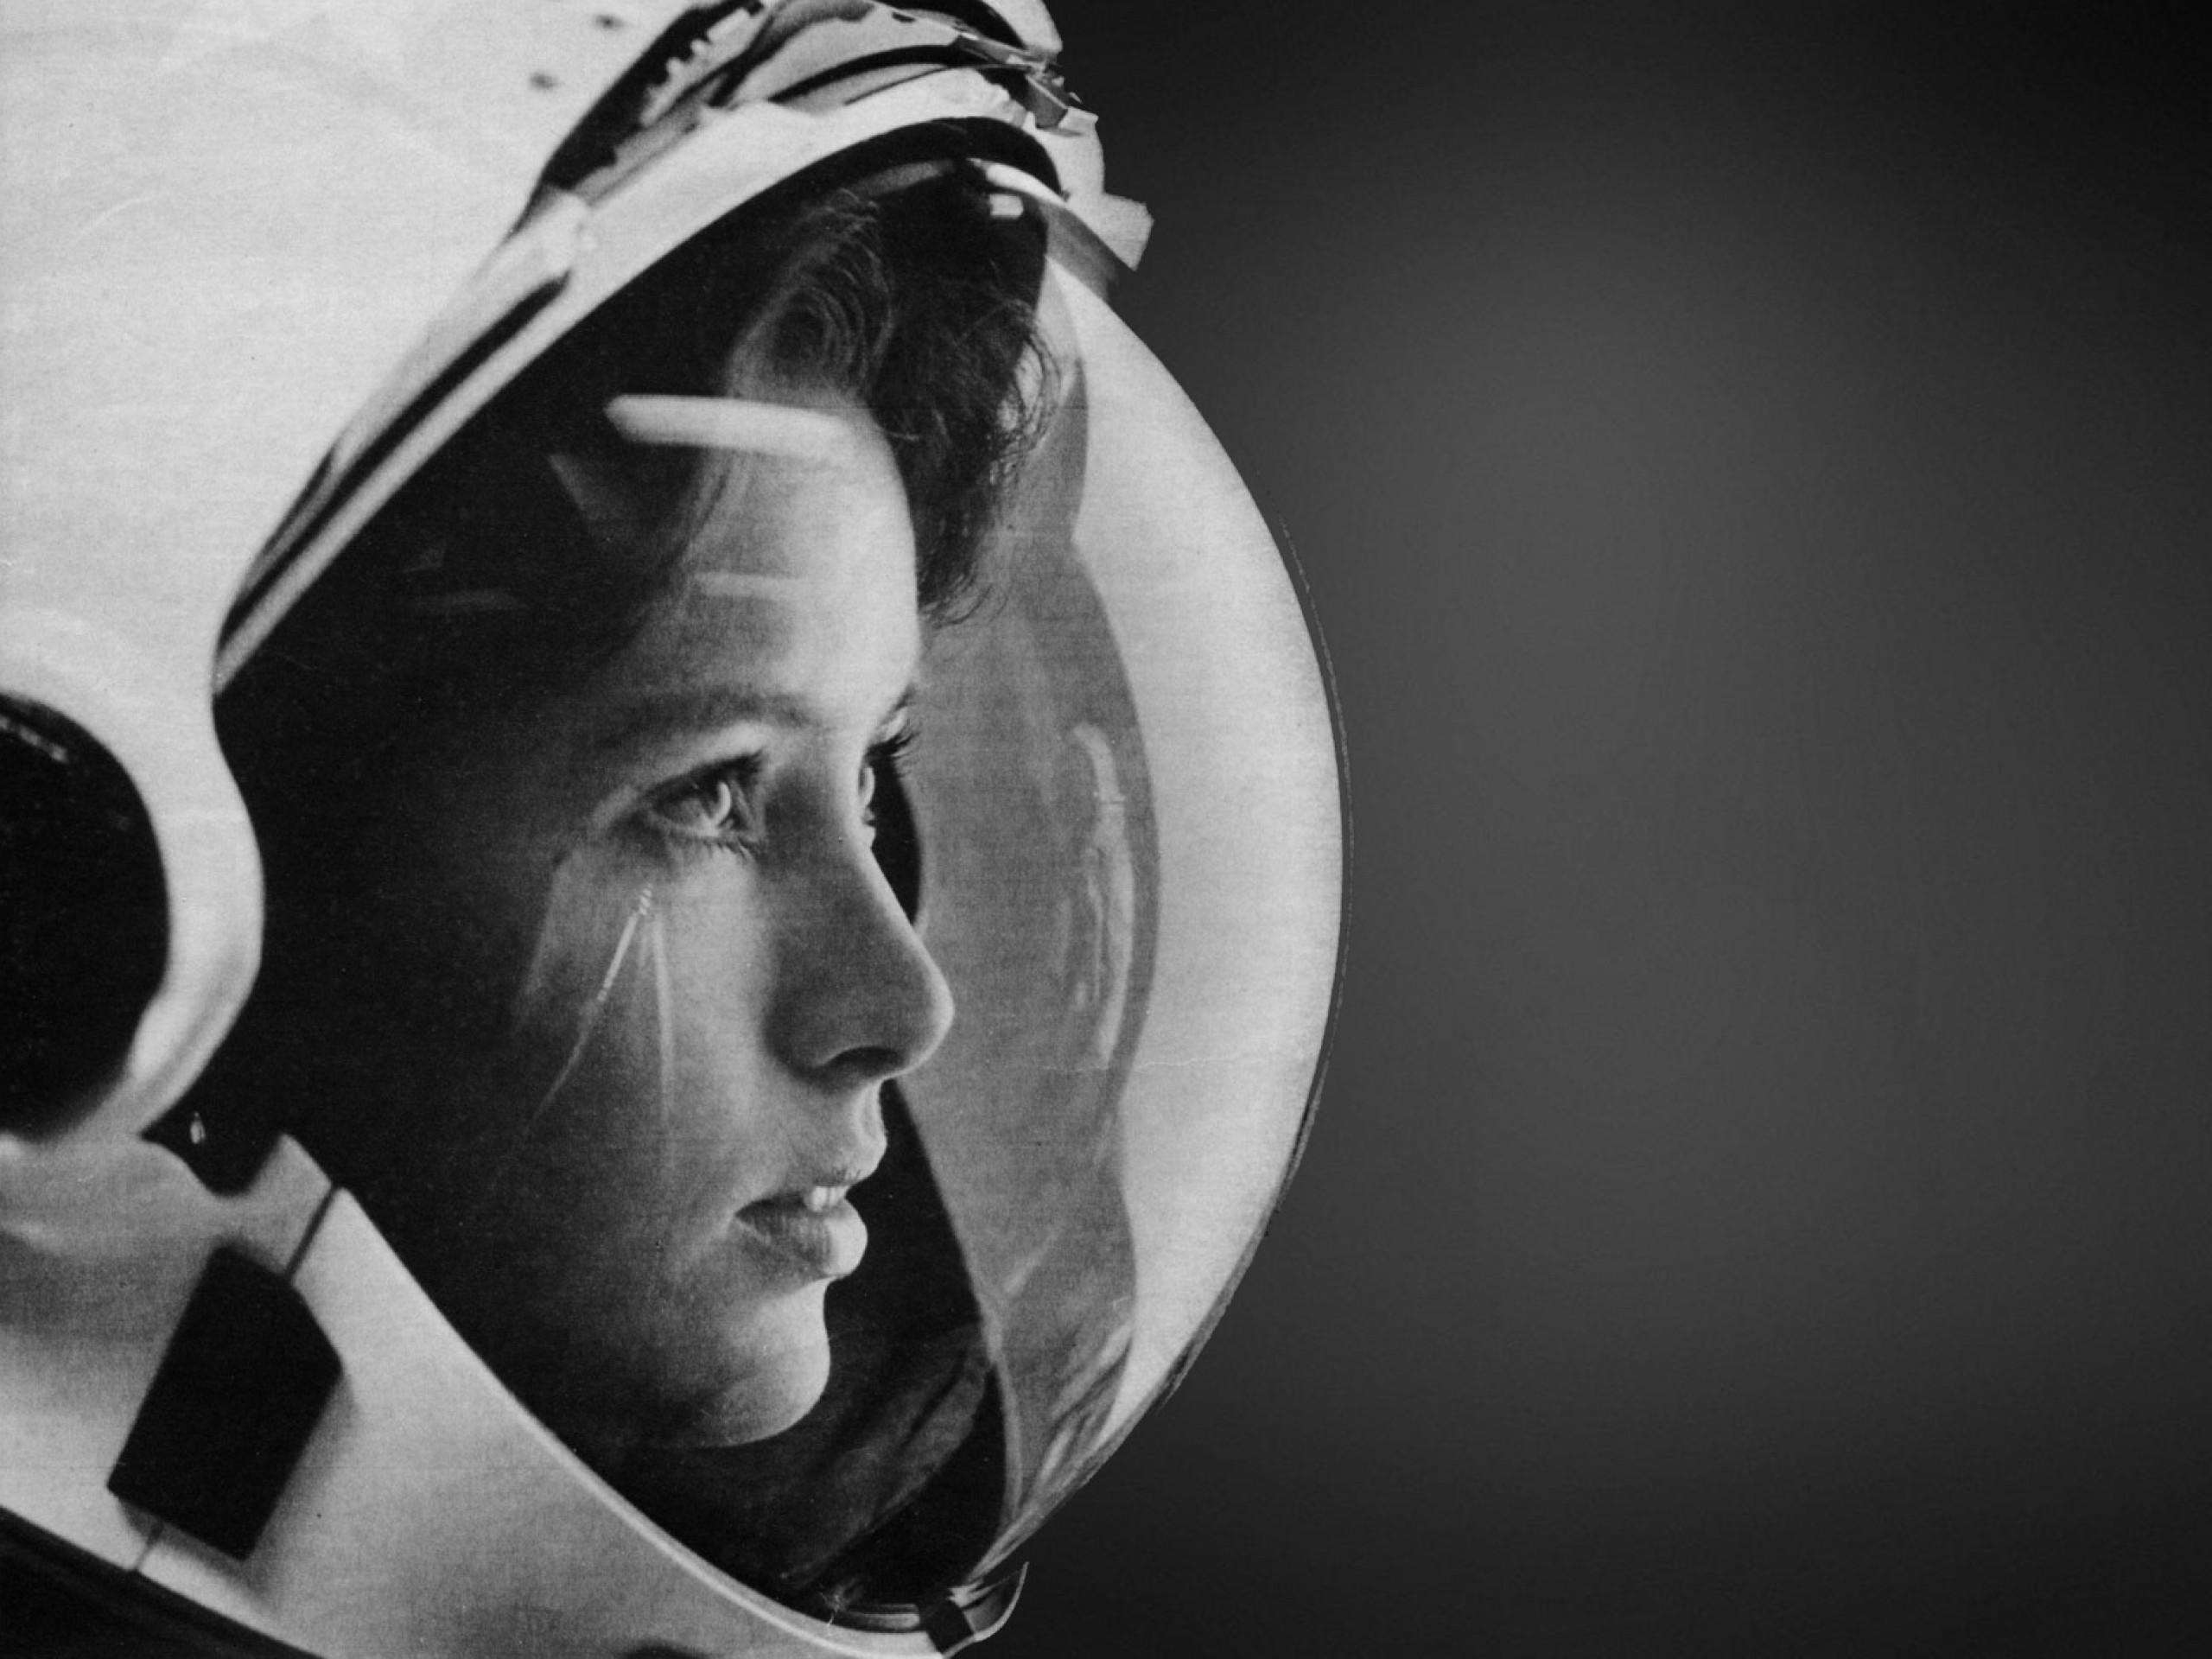 wallpaper.wiki-HD-Astronaut-Photos-PIC-WPD003847-1